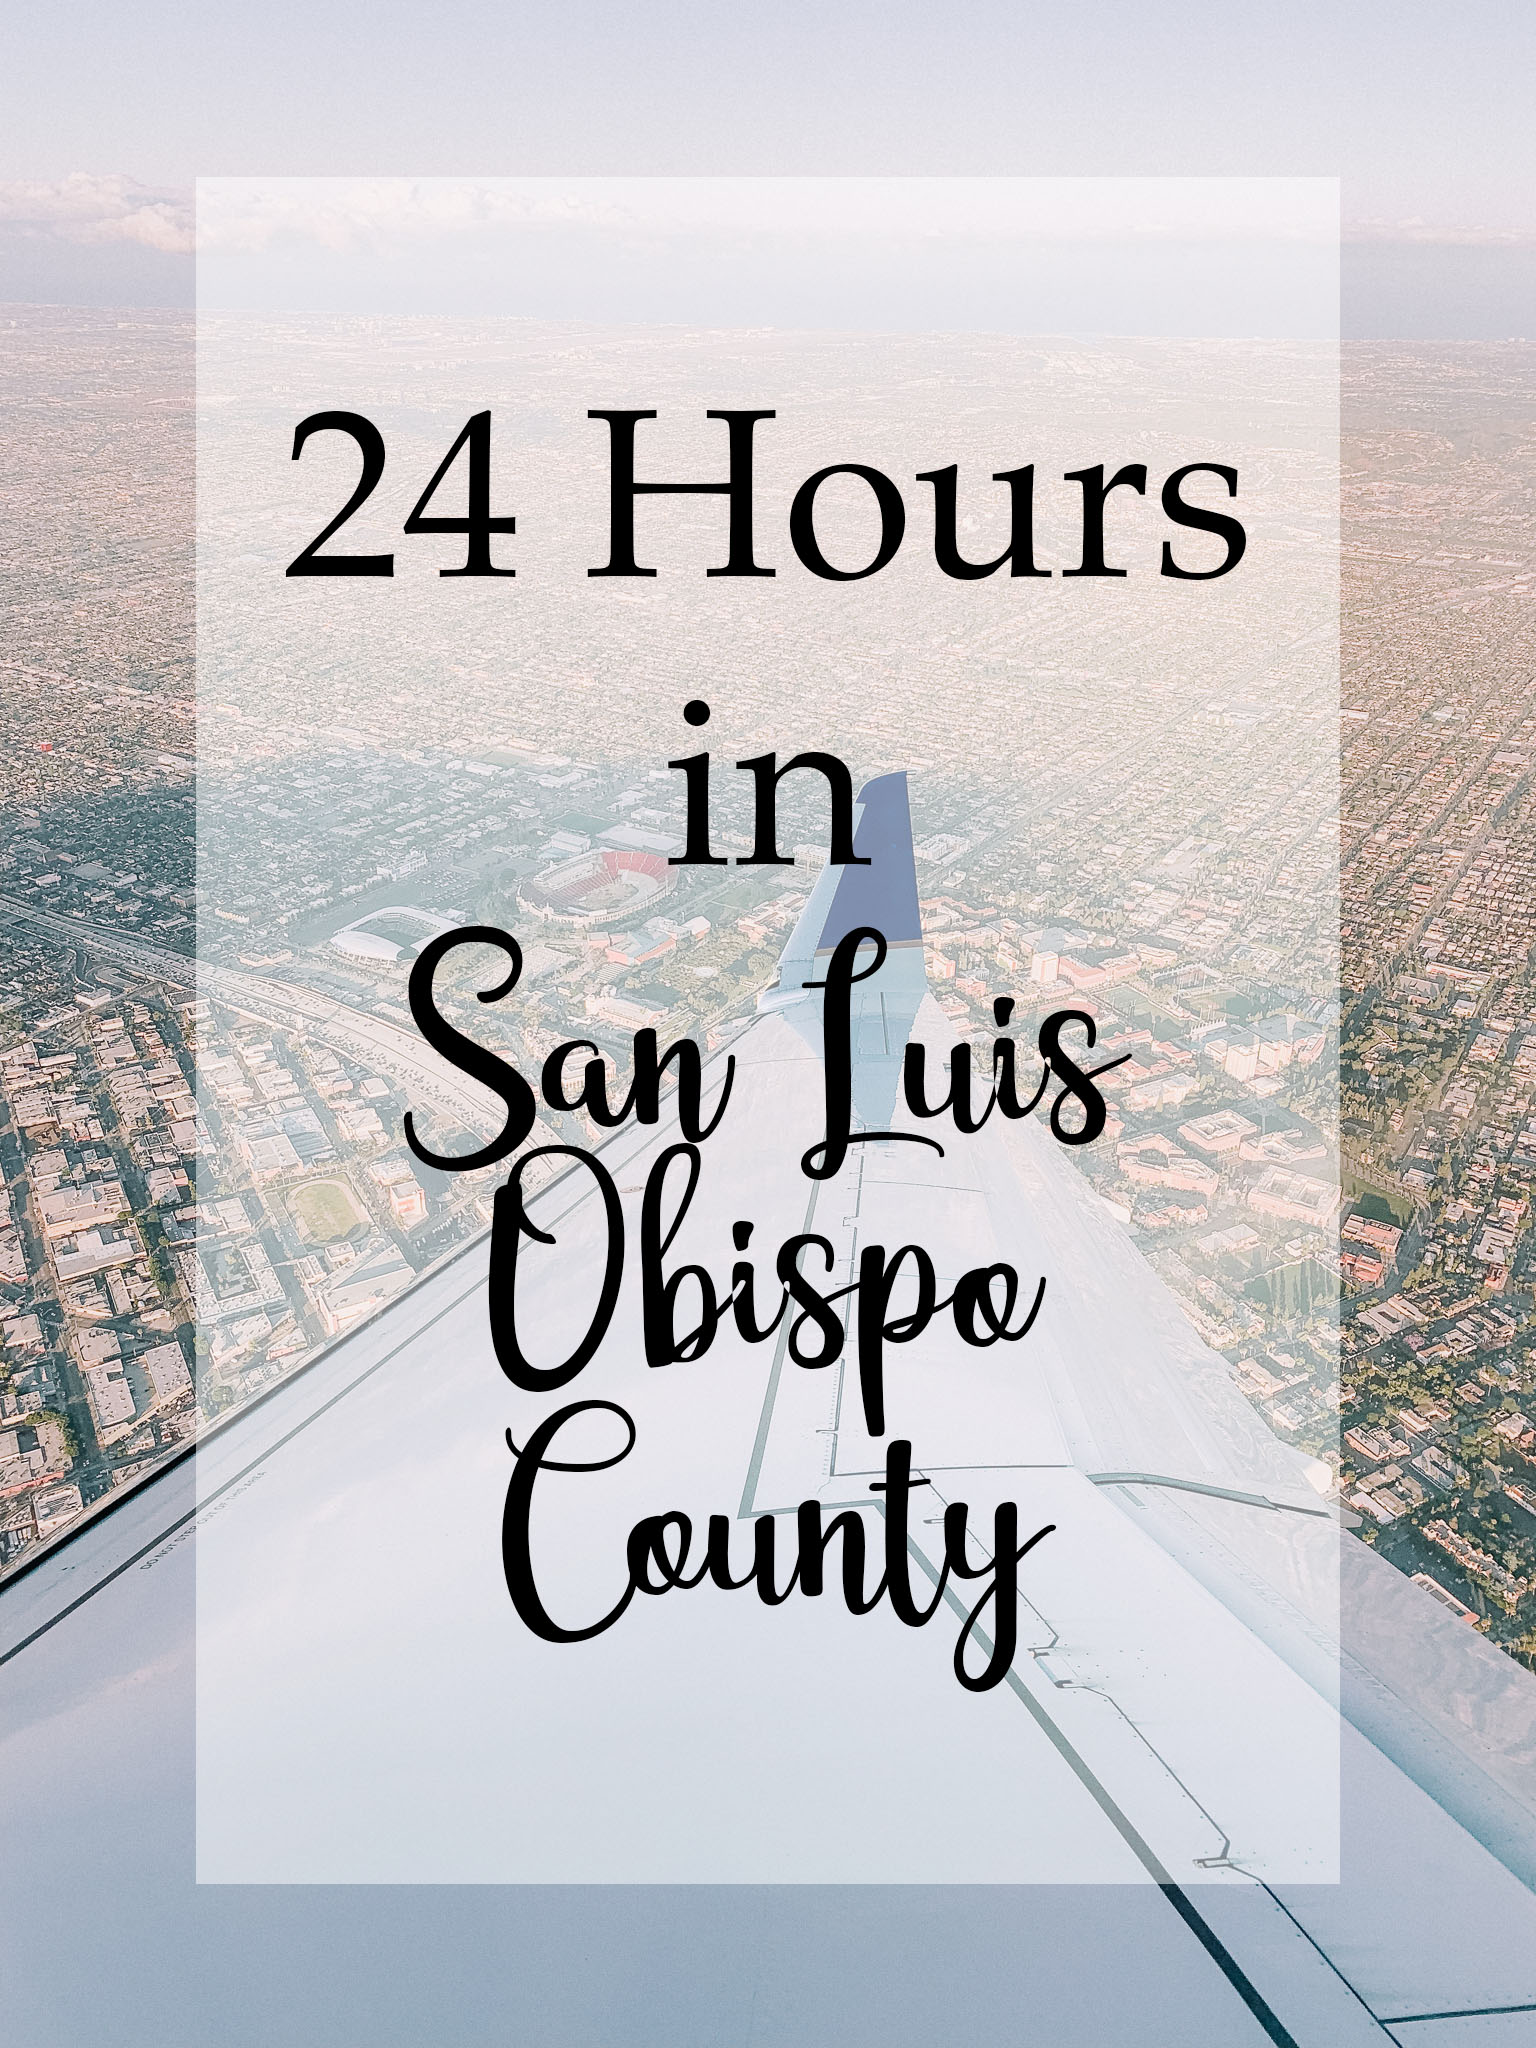 24 Hours in San Luis Obispo County